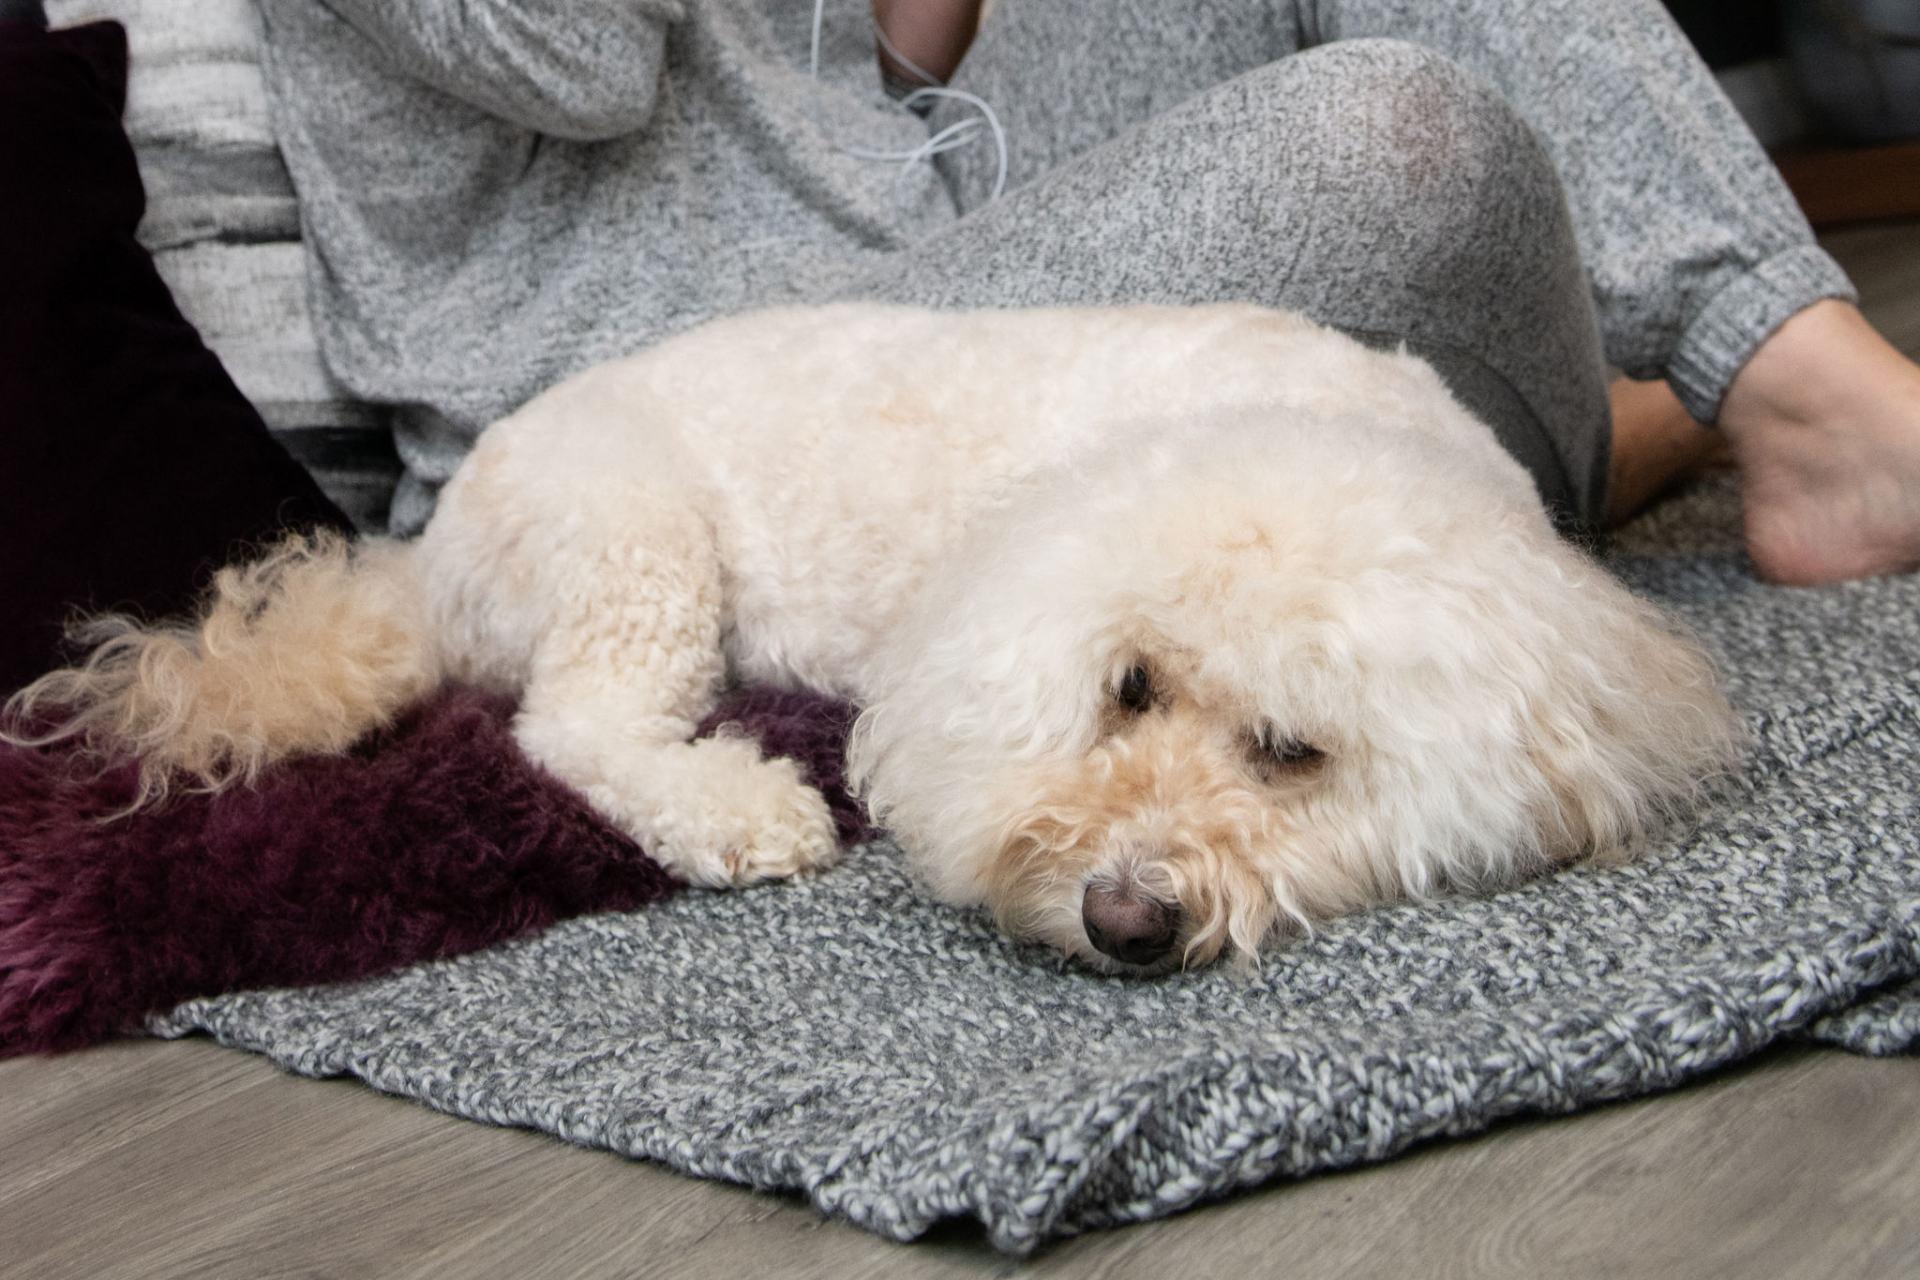 Bichonpoo lying on a rug